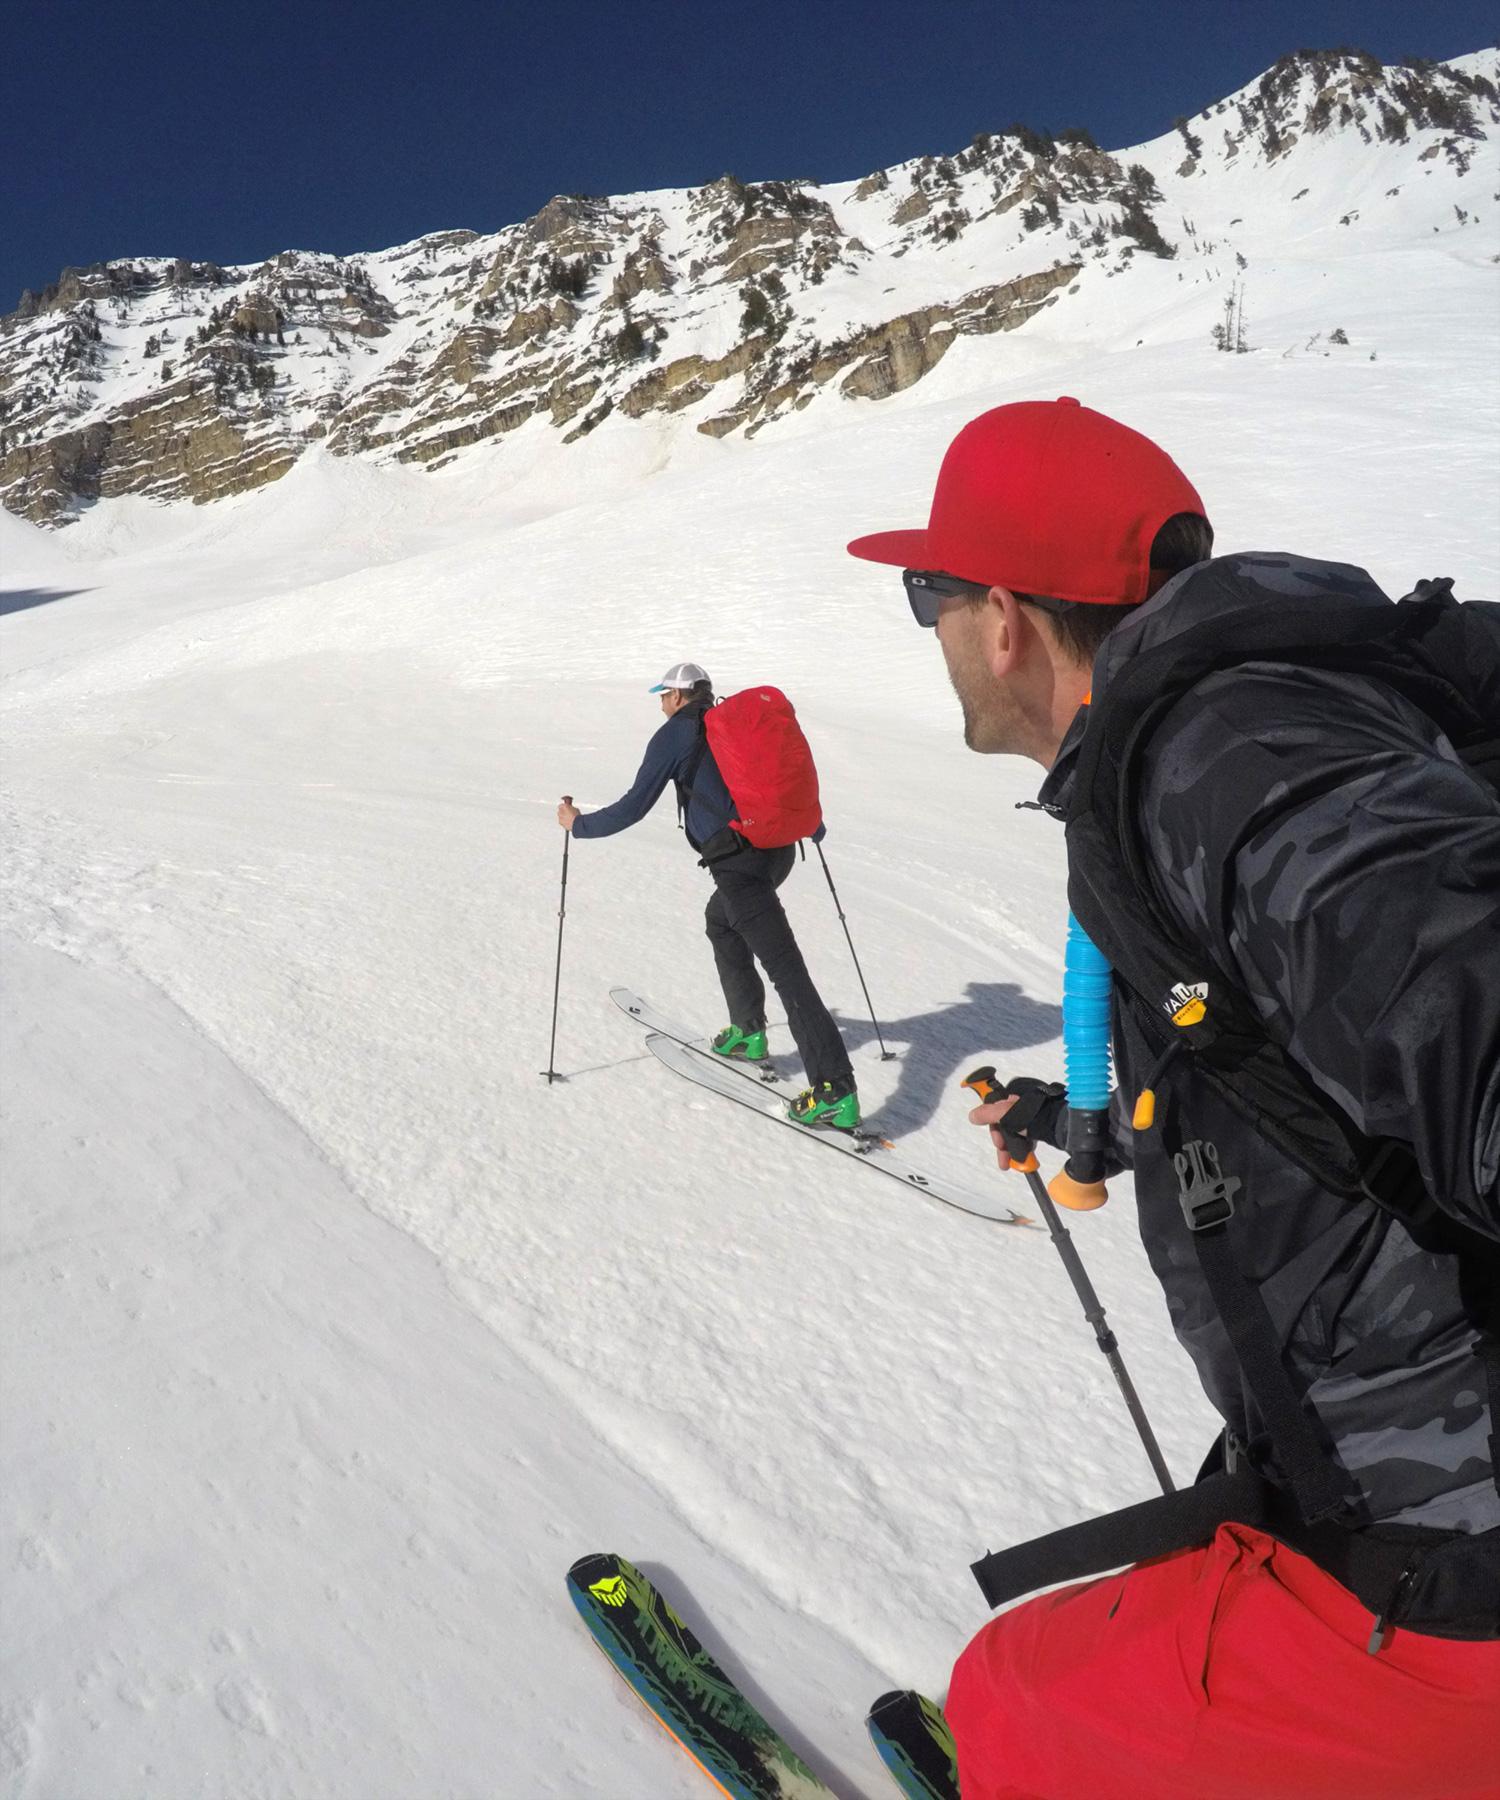 burke-alder-primrose-cirque-ski-approach.jpg